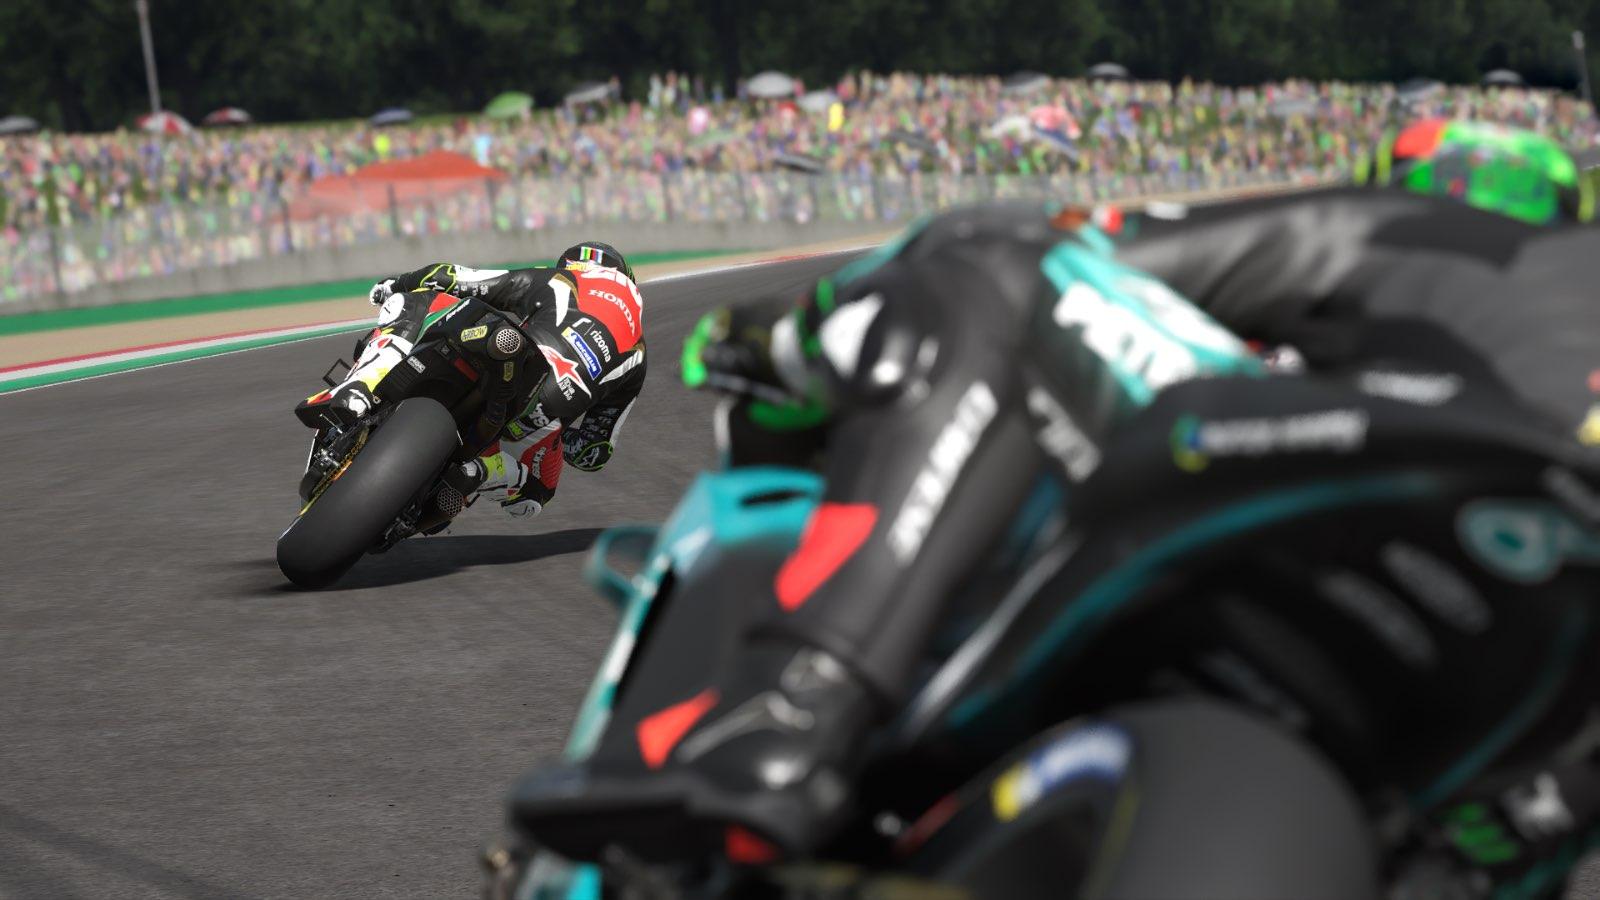 MotoGP20 Videogame - Extreme Realism